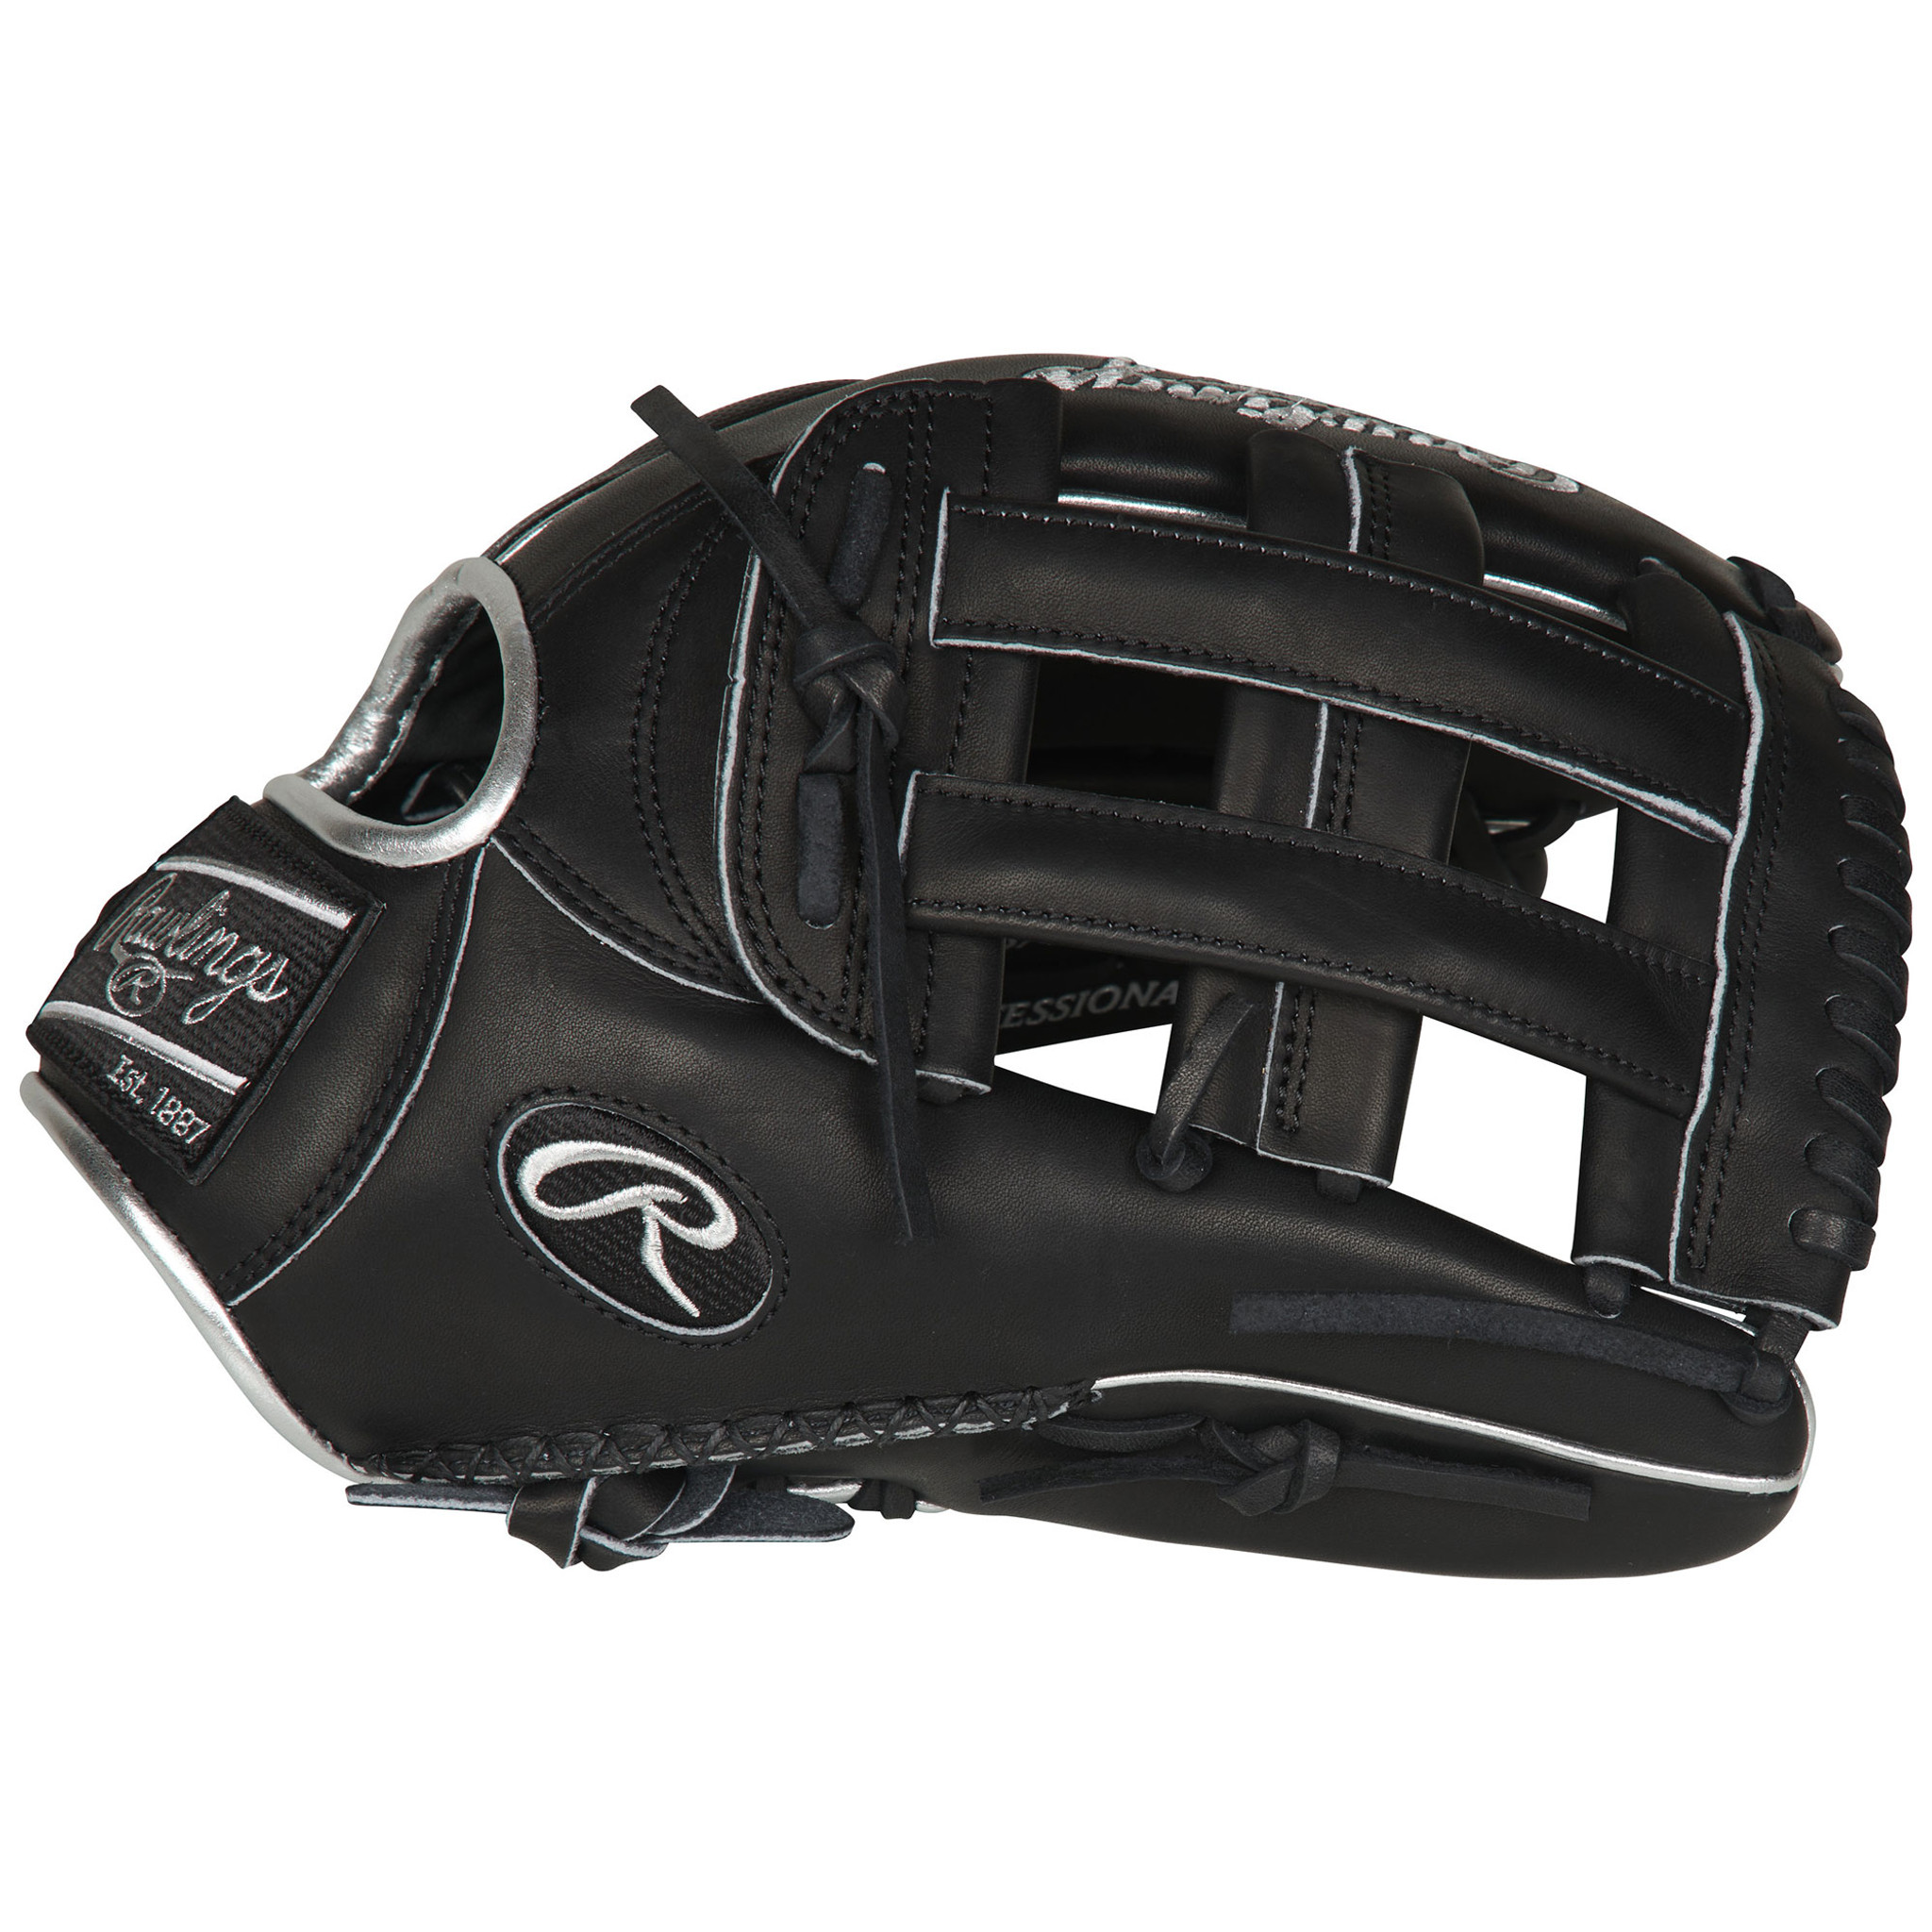 PRO3039-6CB PRO3039-6CB Rawlings Heart of The Hide Color Sync 4.0 12.75 Baseball Glove